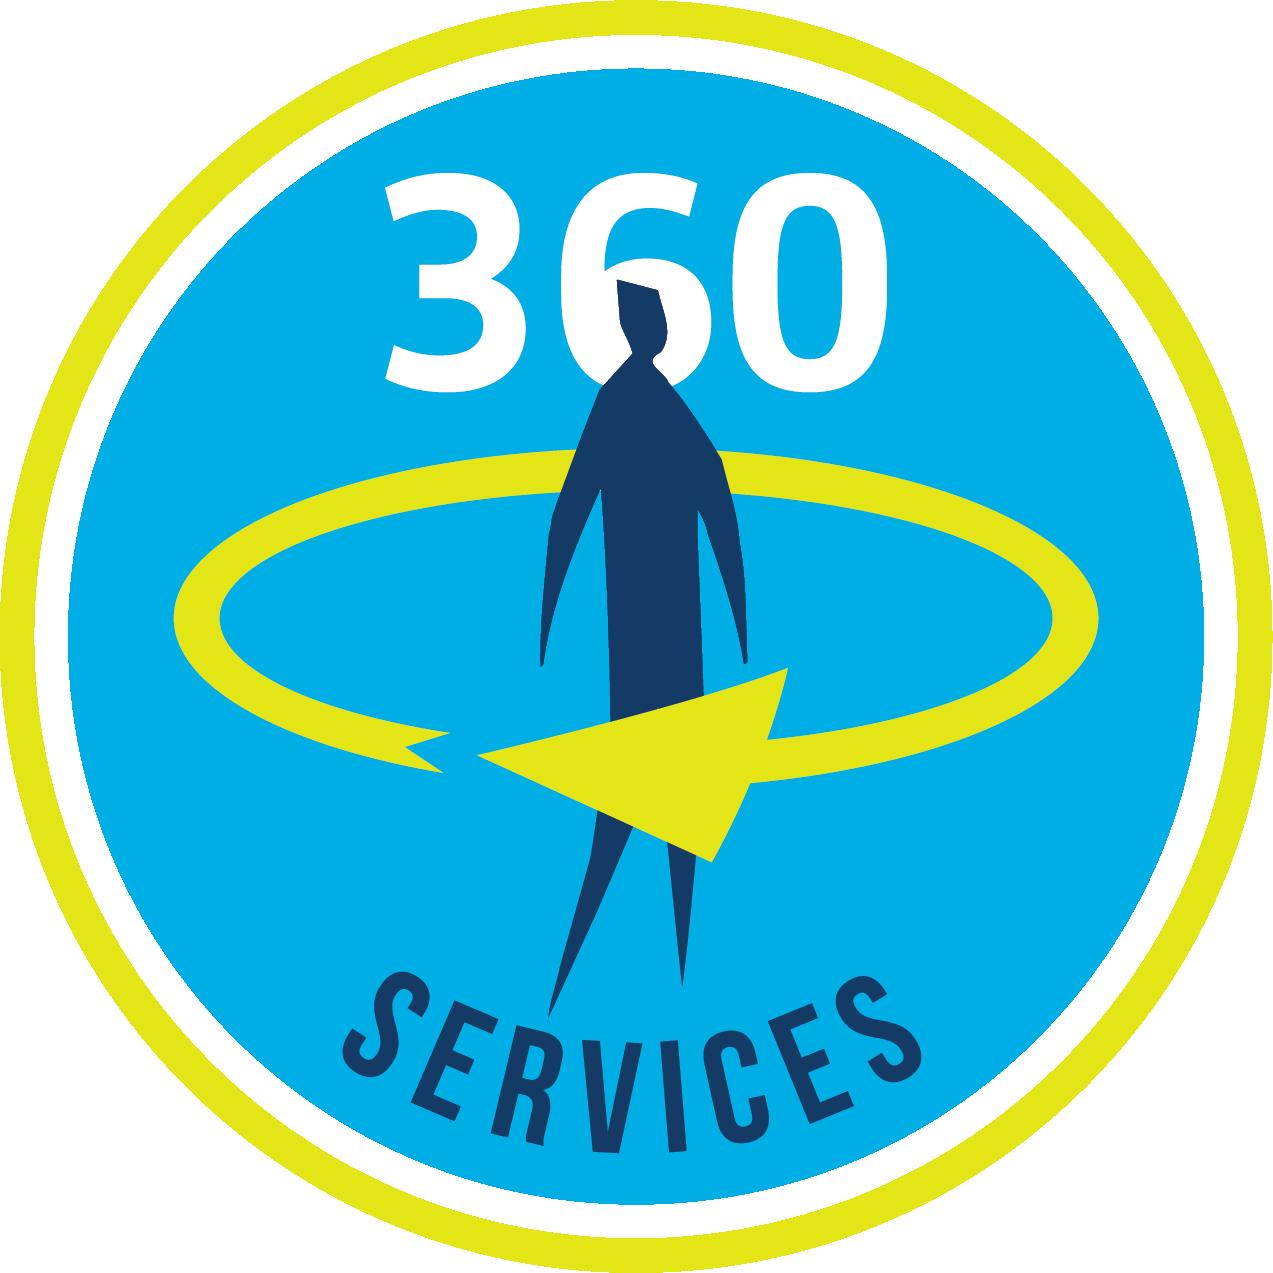 aclvb-universele_diensten-logo-cmyk_ok_fr_4.png